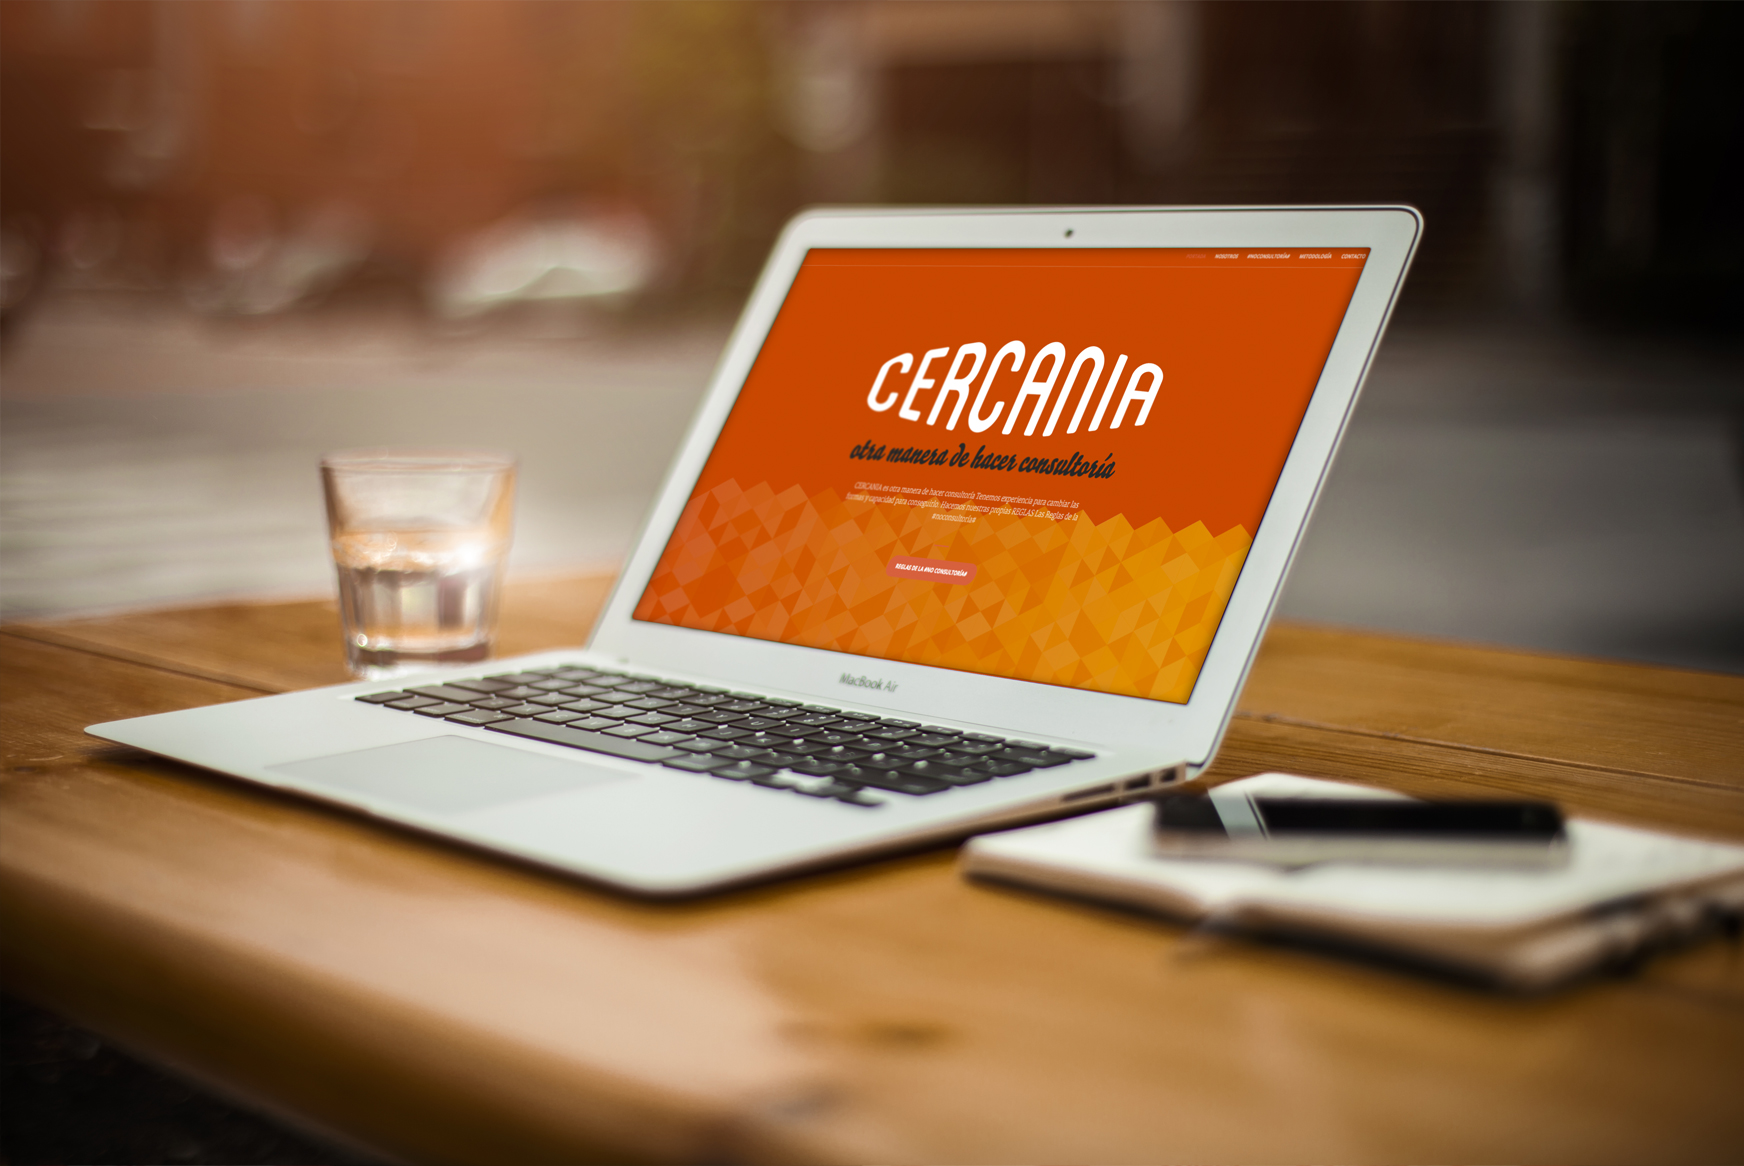 WebCercania